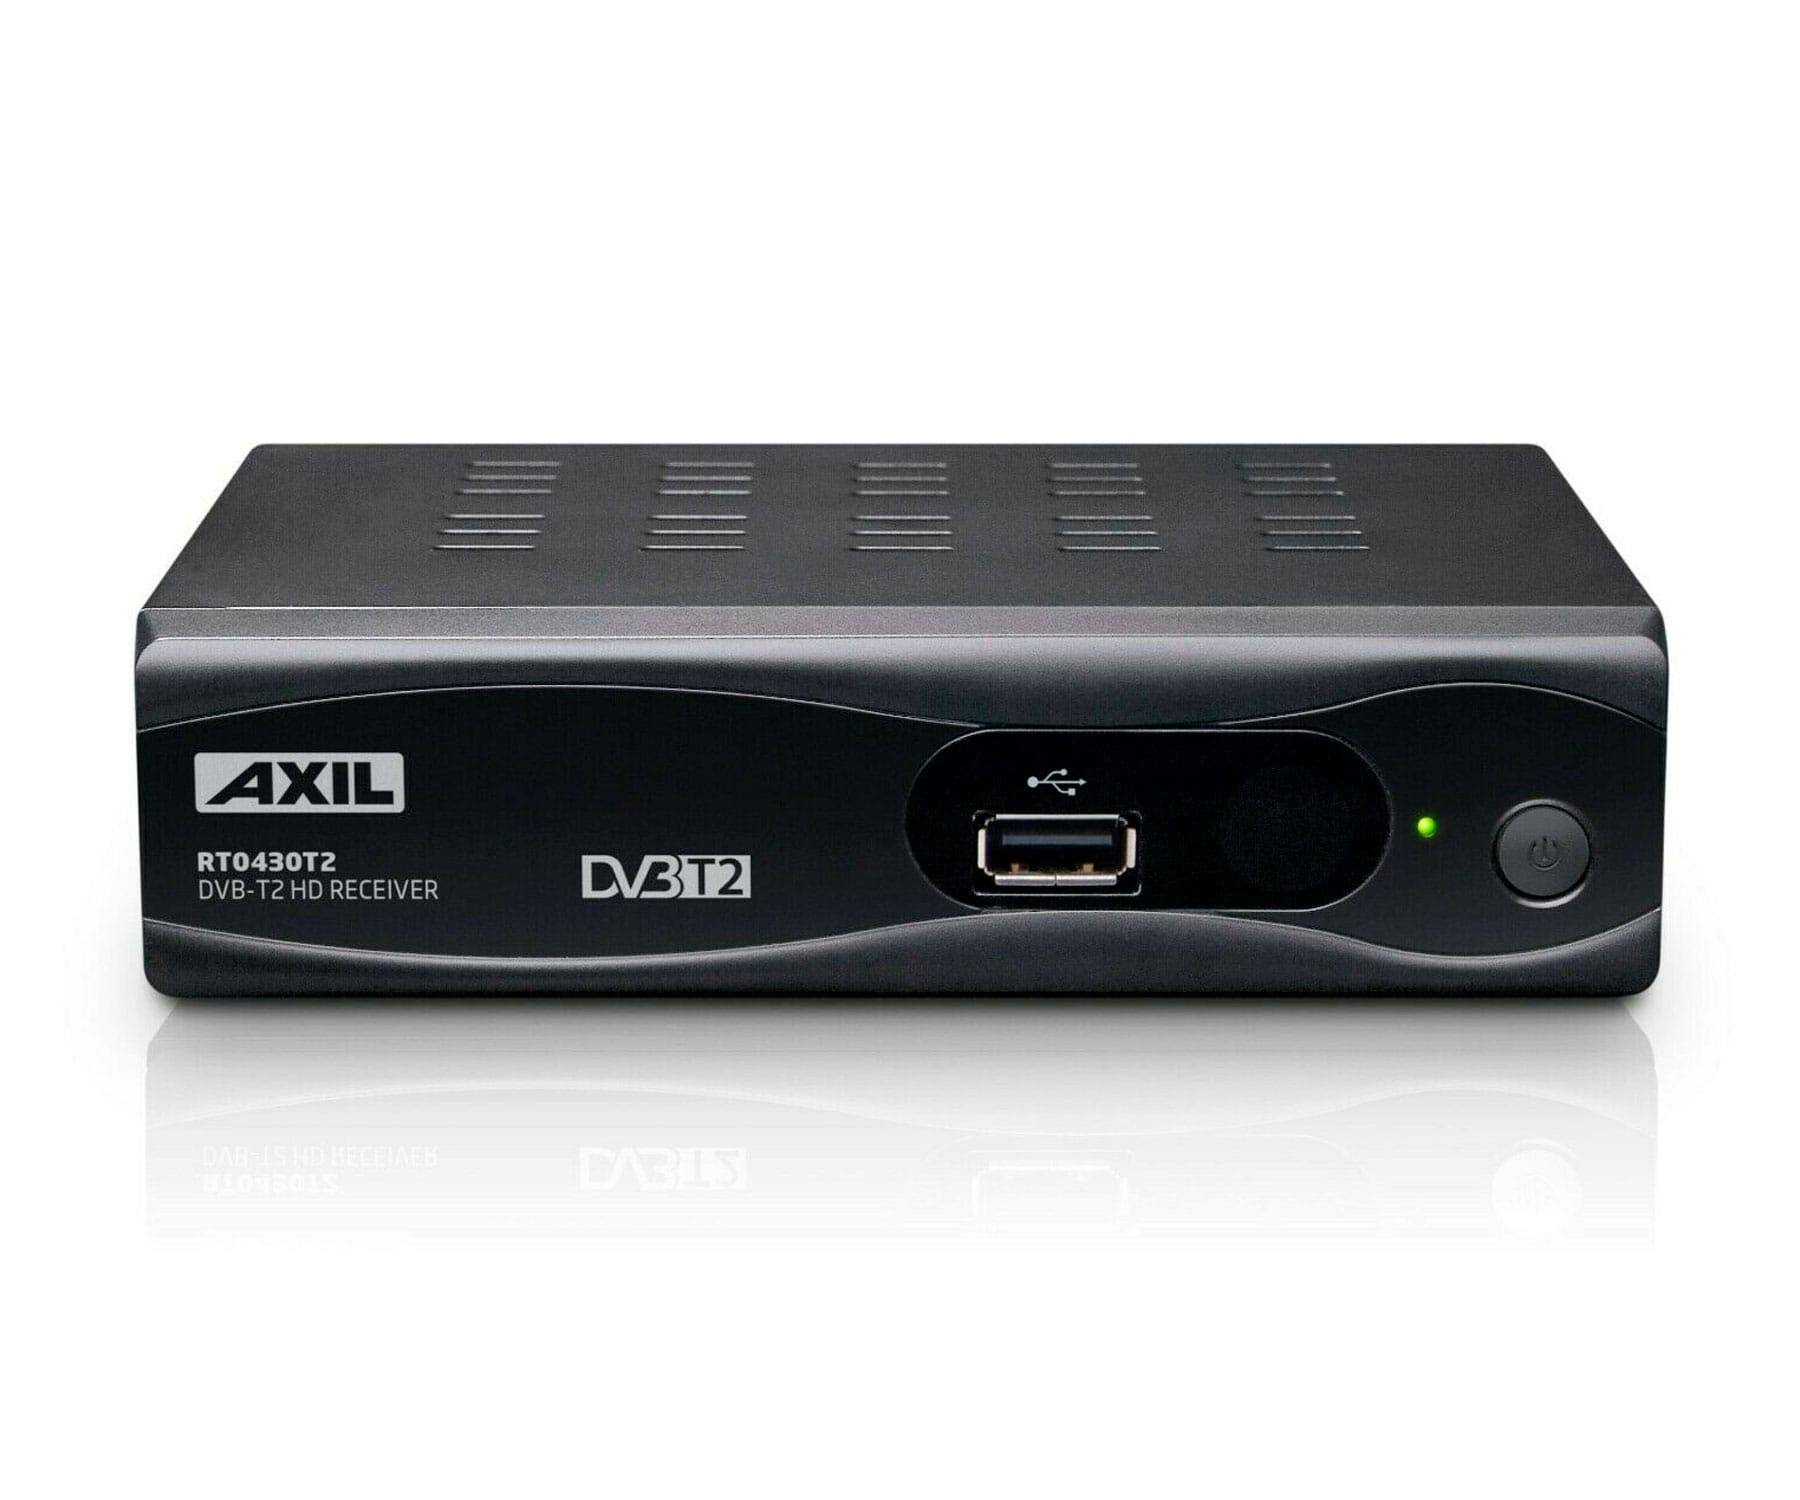 Engel RT0430T2 DVB-T2 HD grabador + USB 2.0/HDMI/Euroconector